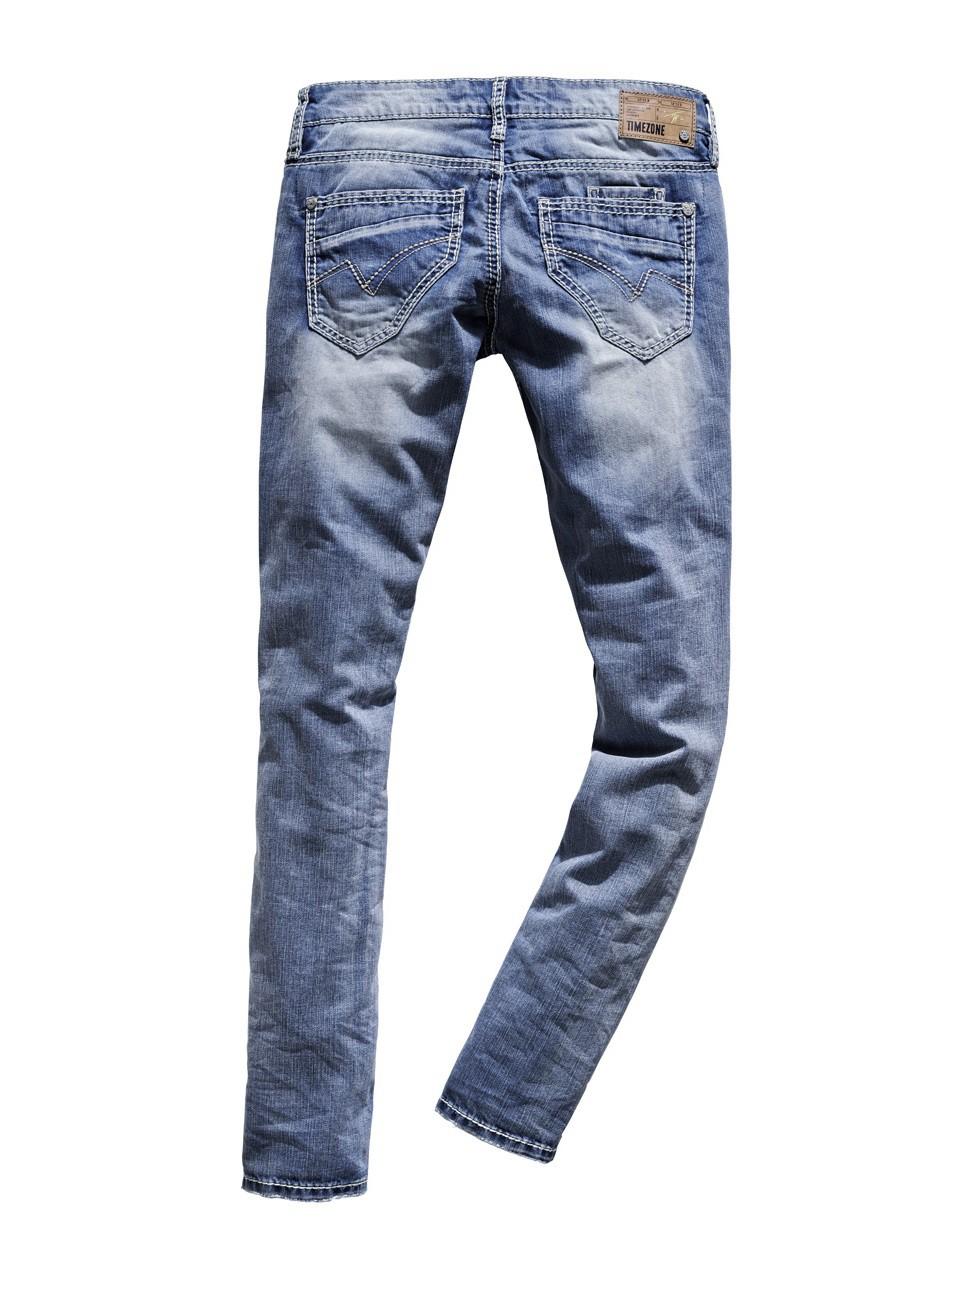 timezone damen jeans ninitz 16 5488 slim fit cool bleach wash. Black Bedroom Furniture Sets. Home Design Ideas